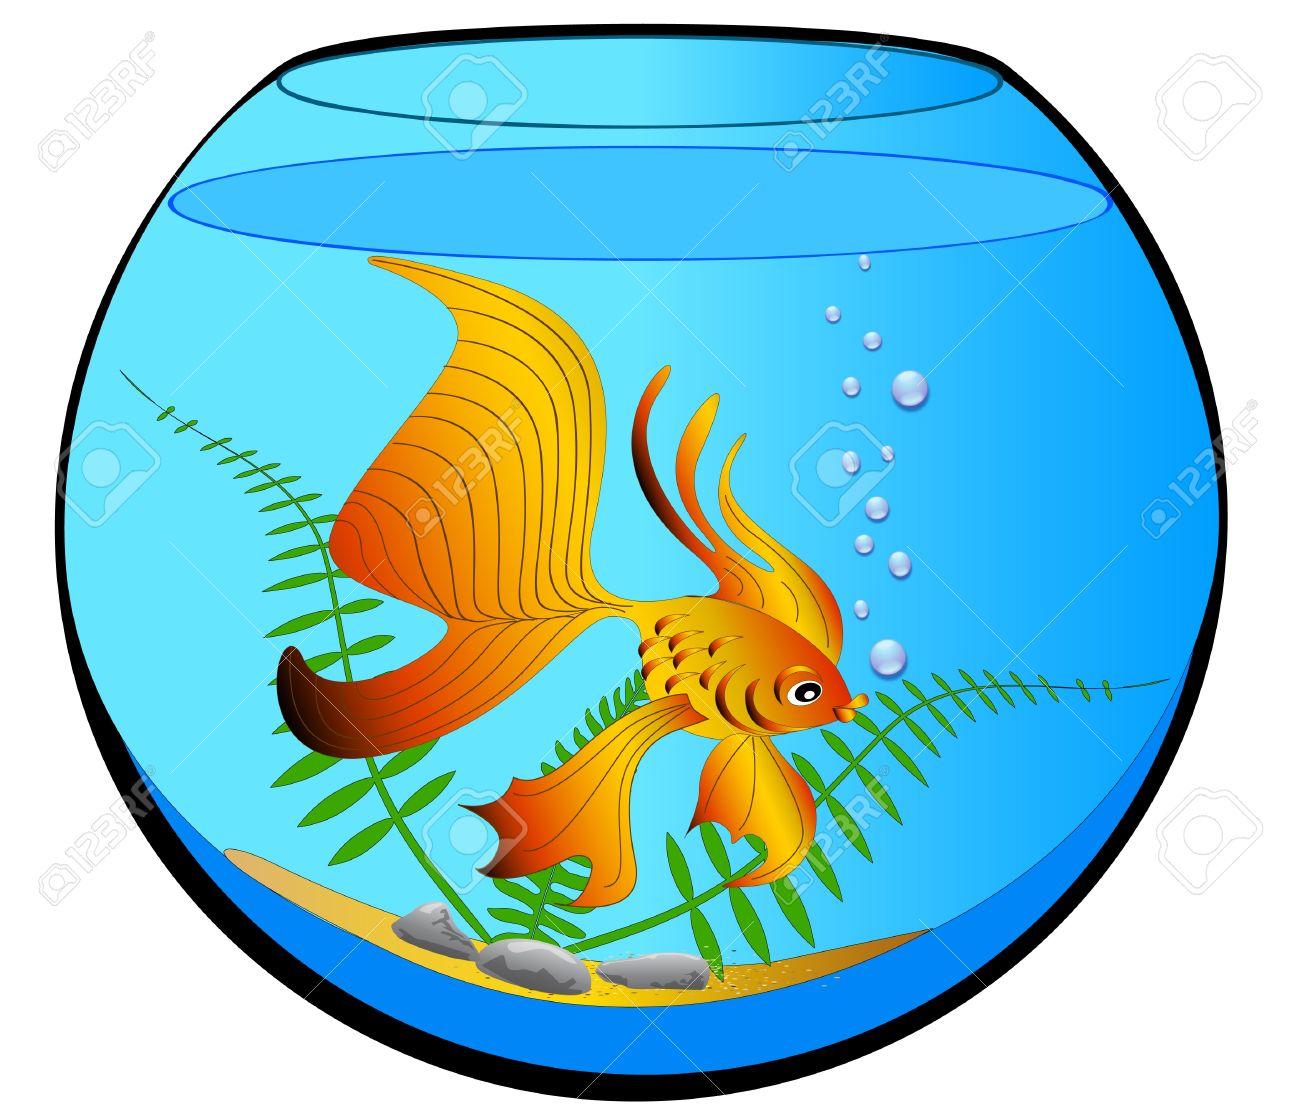 Fish tank clipart - Fish Tank Illustration Aquarium With Gold Fish And Algae Illustration